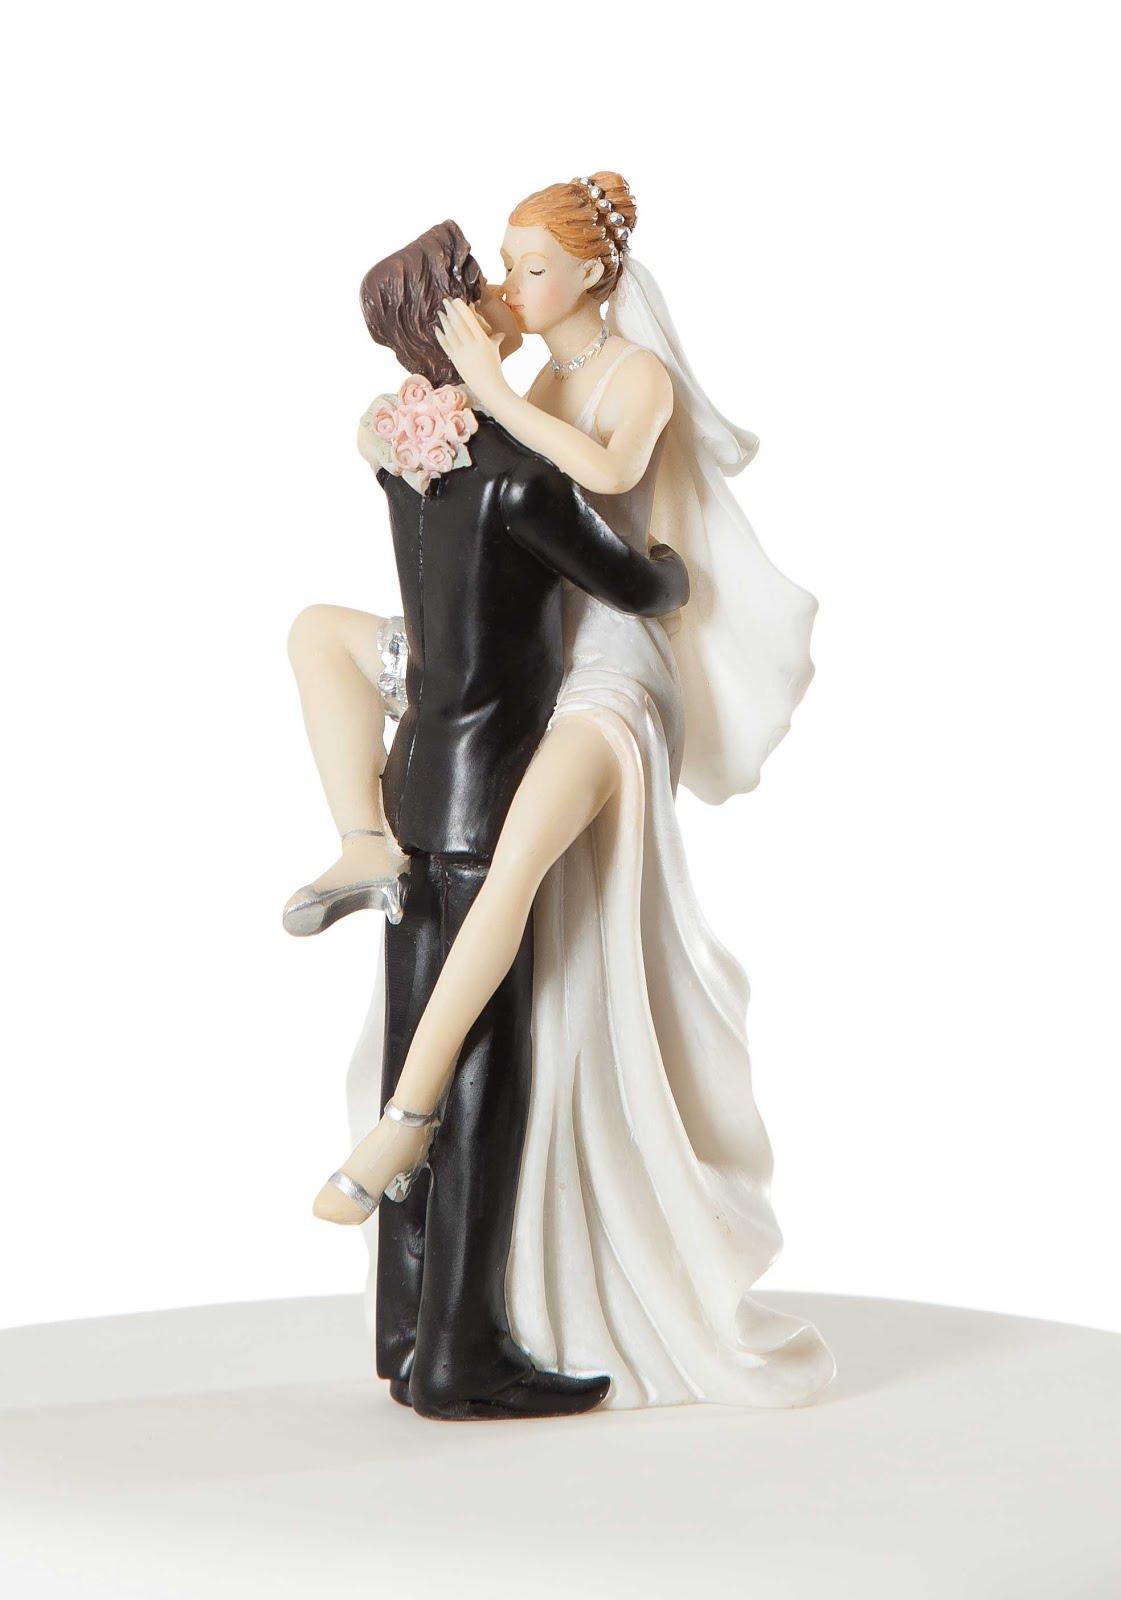 [Groom Bride Dragging Quot Car Mechanic Wedding Cake